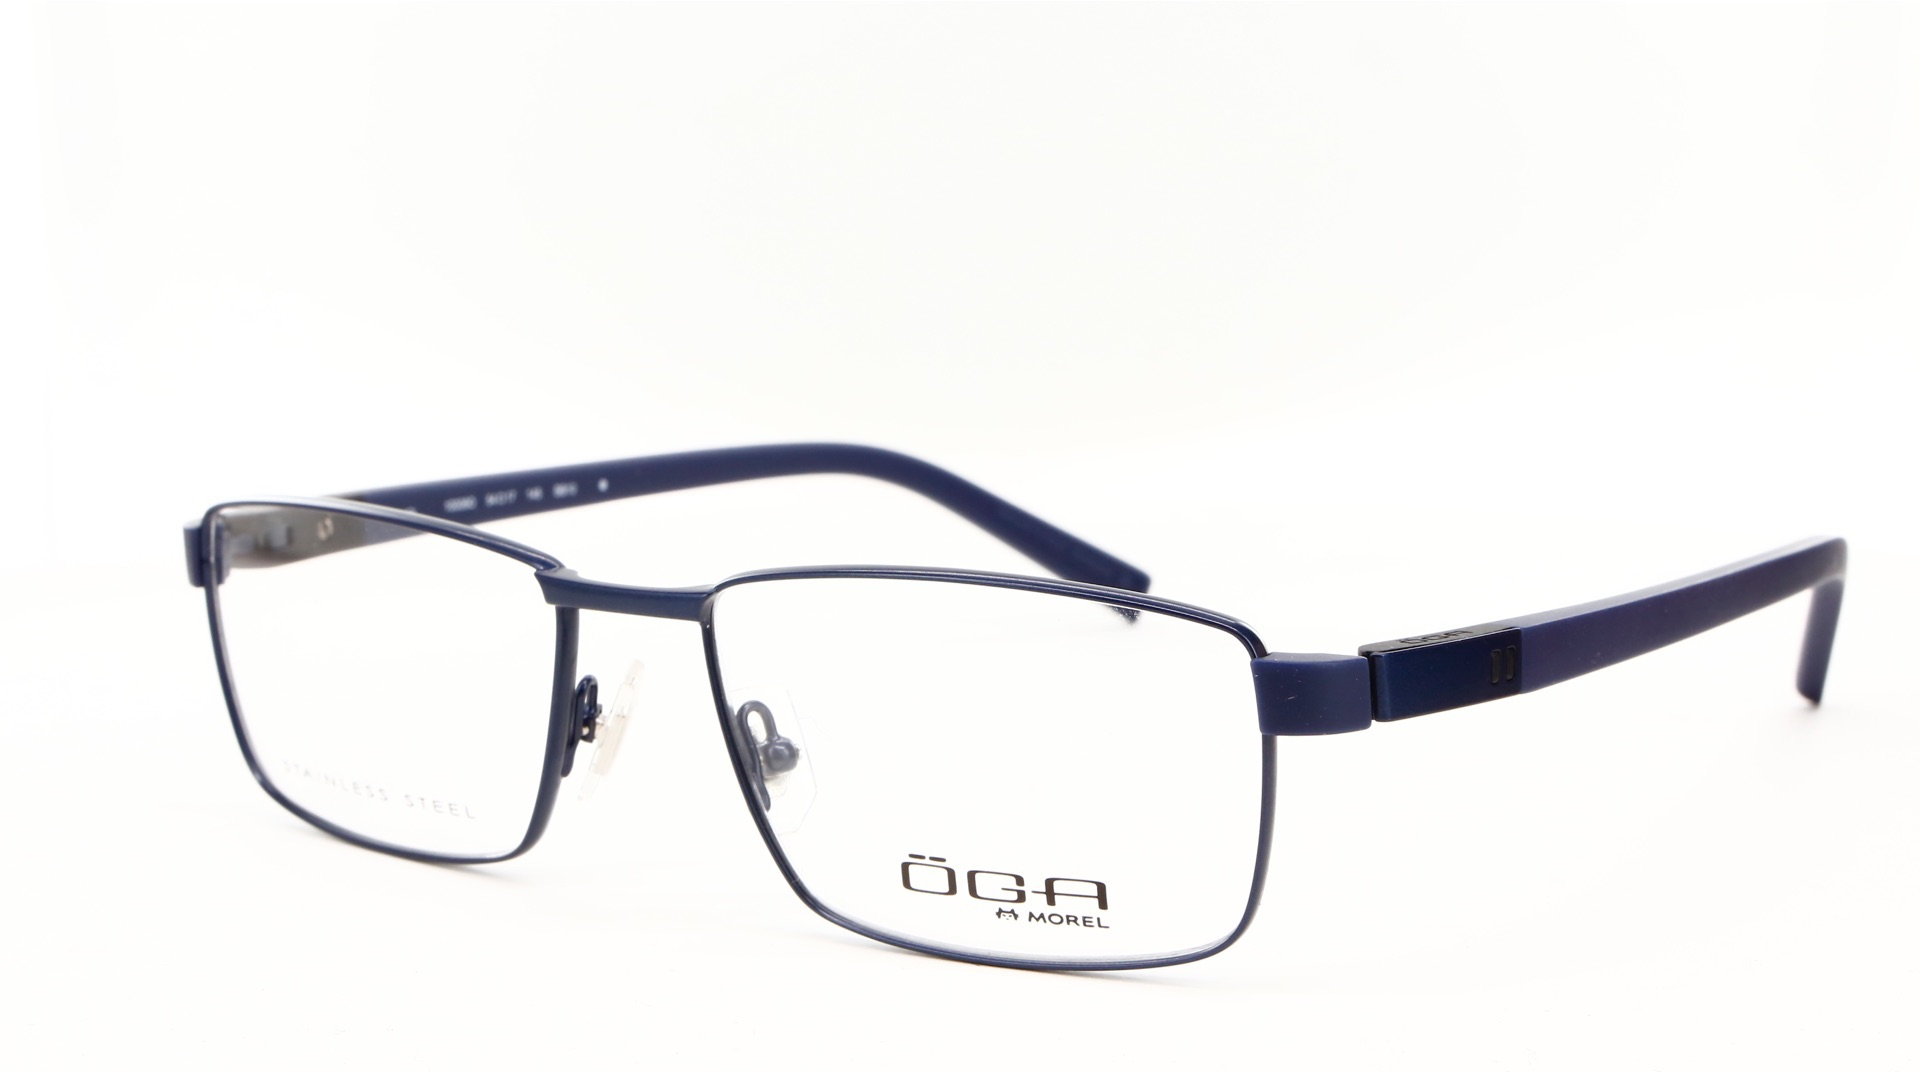 OGA - ref: 78973